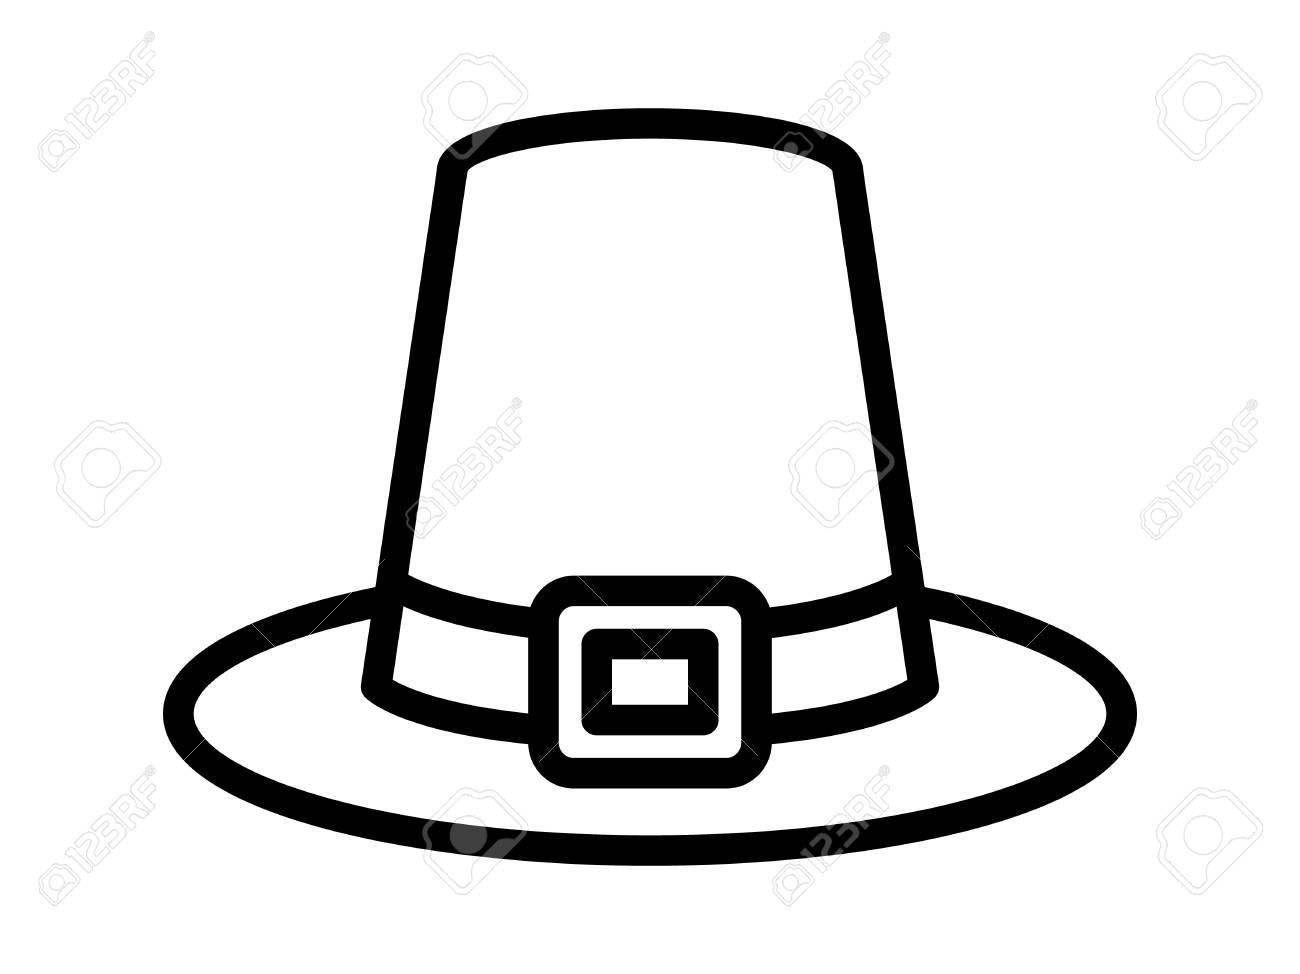 pilgrim hat on thanksgiving or capotain line art icon for apps rh 123rf com